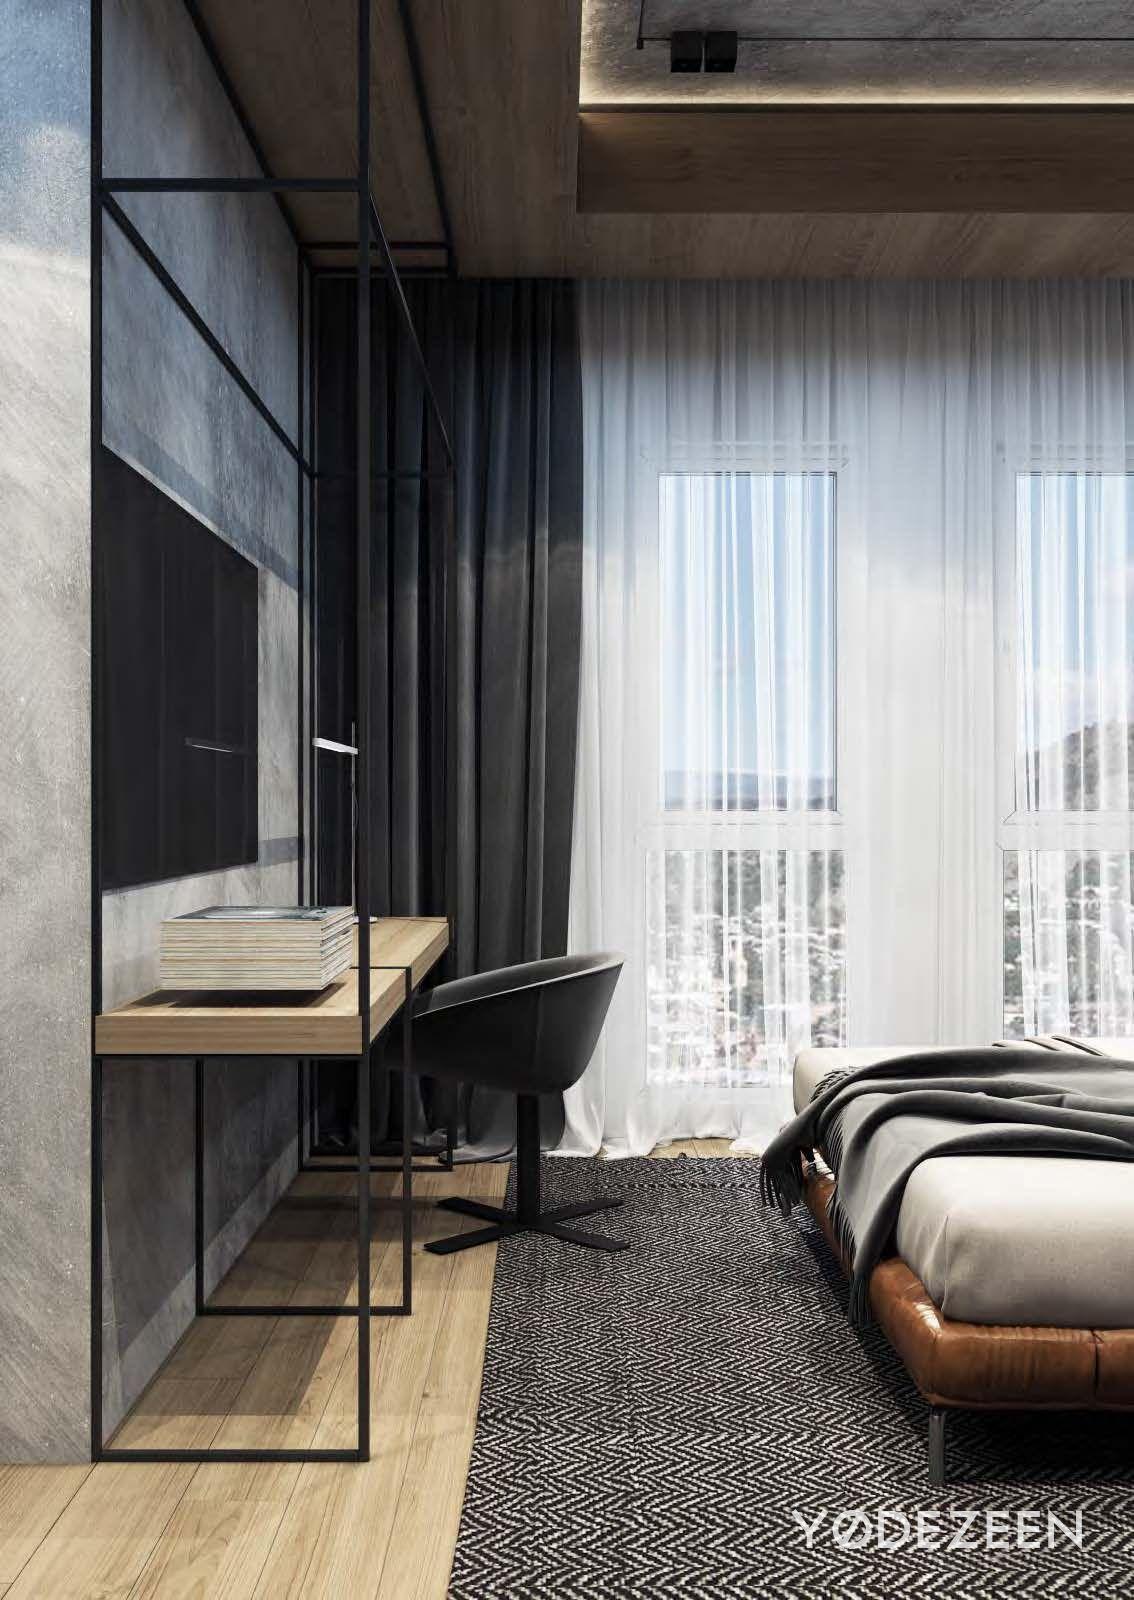 Hotel Room Designs: 2a Mekhanizatoriv Street Kyiv, Ukraine Tel. +380688303675